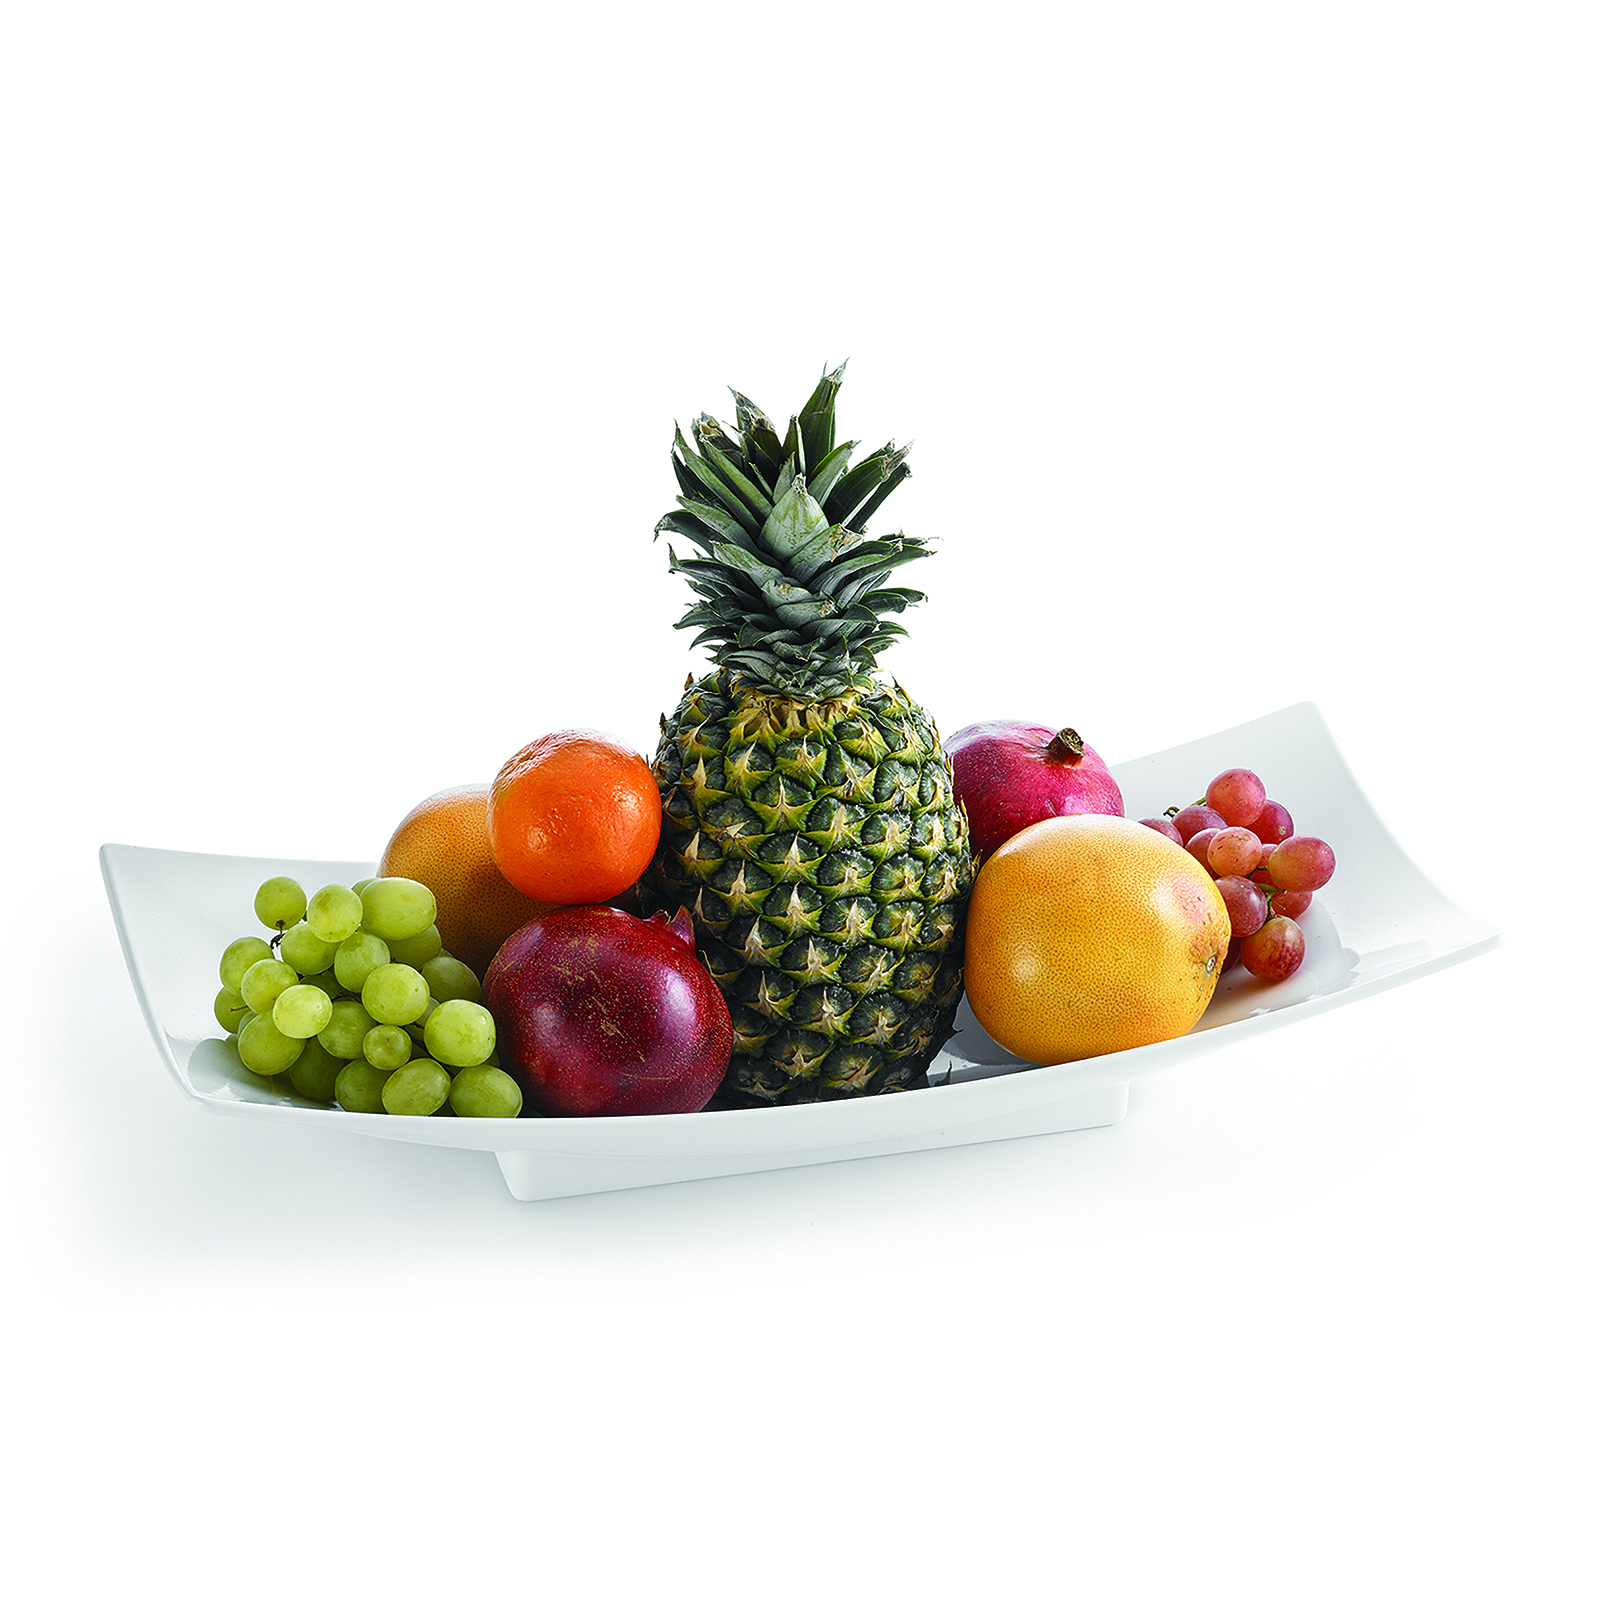 TableCraft Products M4078WH bowl, plastic,  7 - 10 qt (224 - 351 oz)